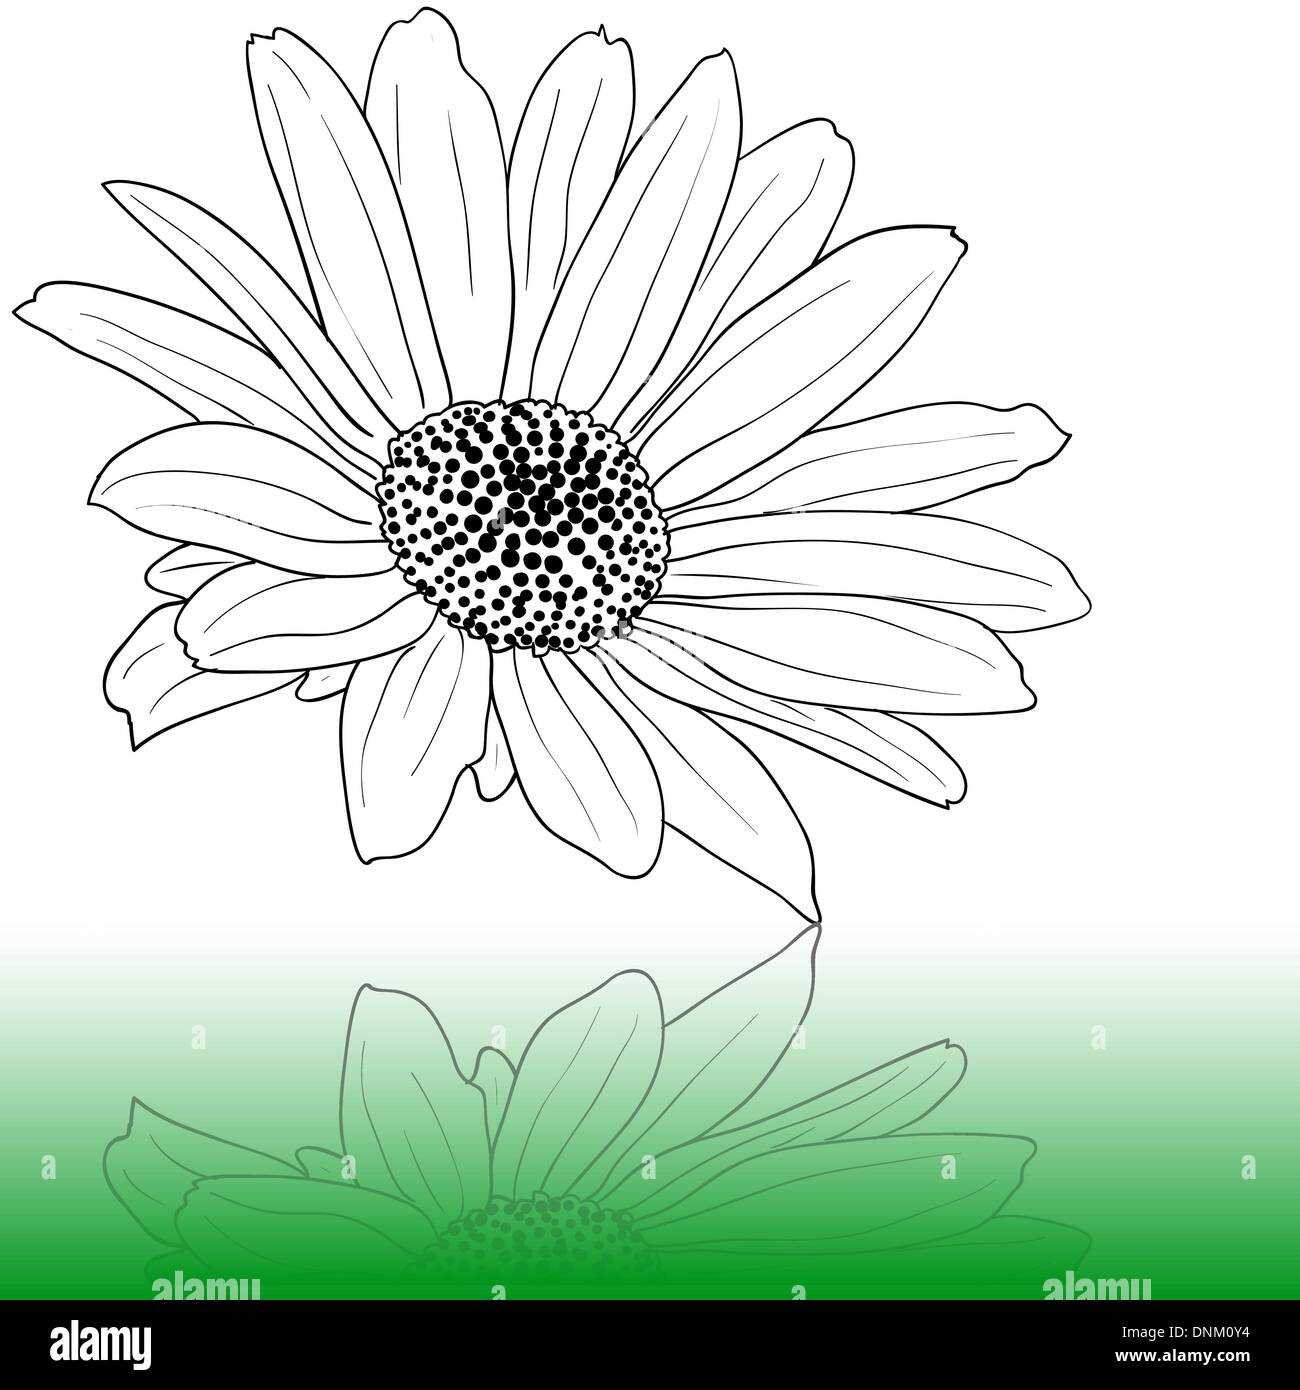 vector hand drawn illustration - Stock Image